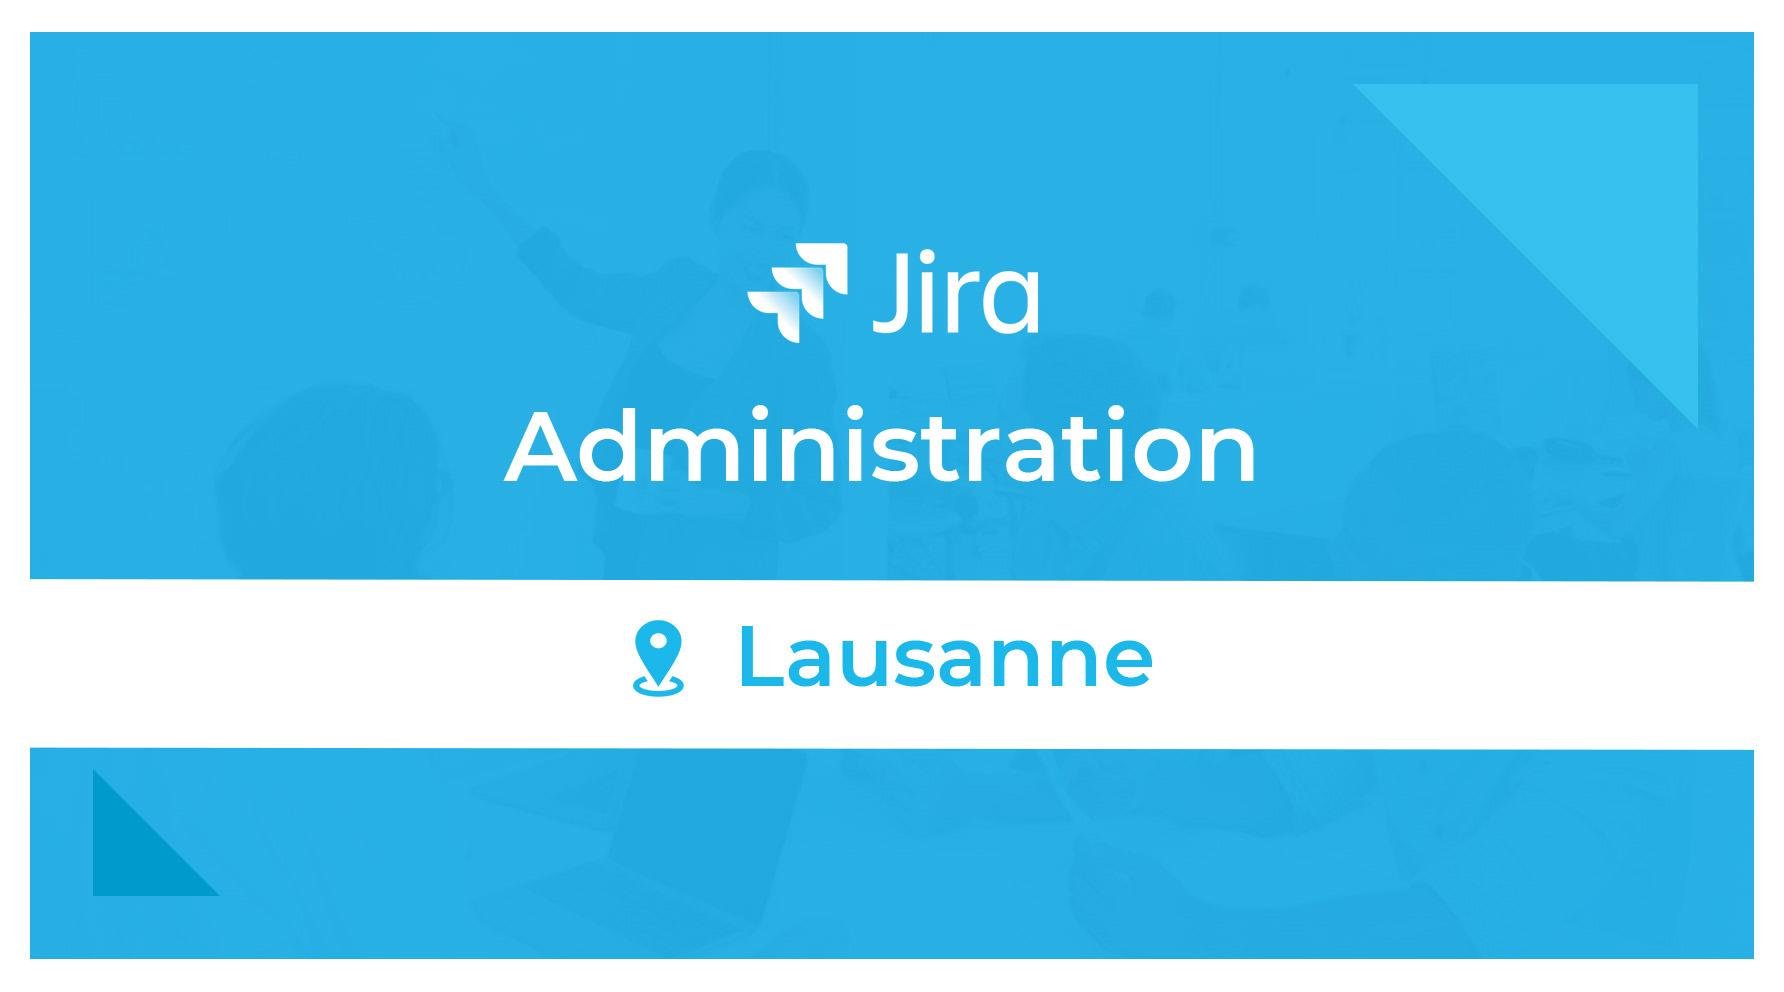 Formation Jira Admin Lausanne